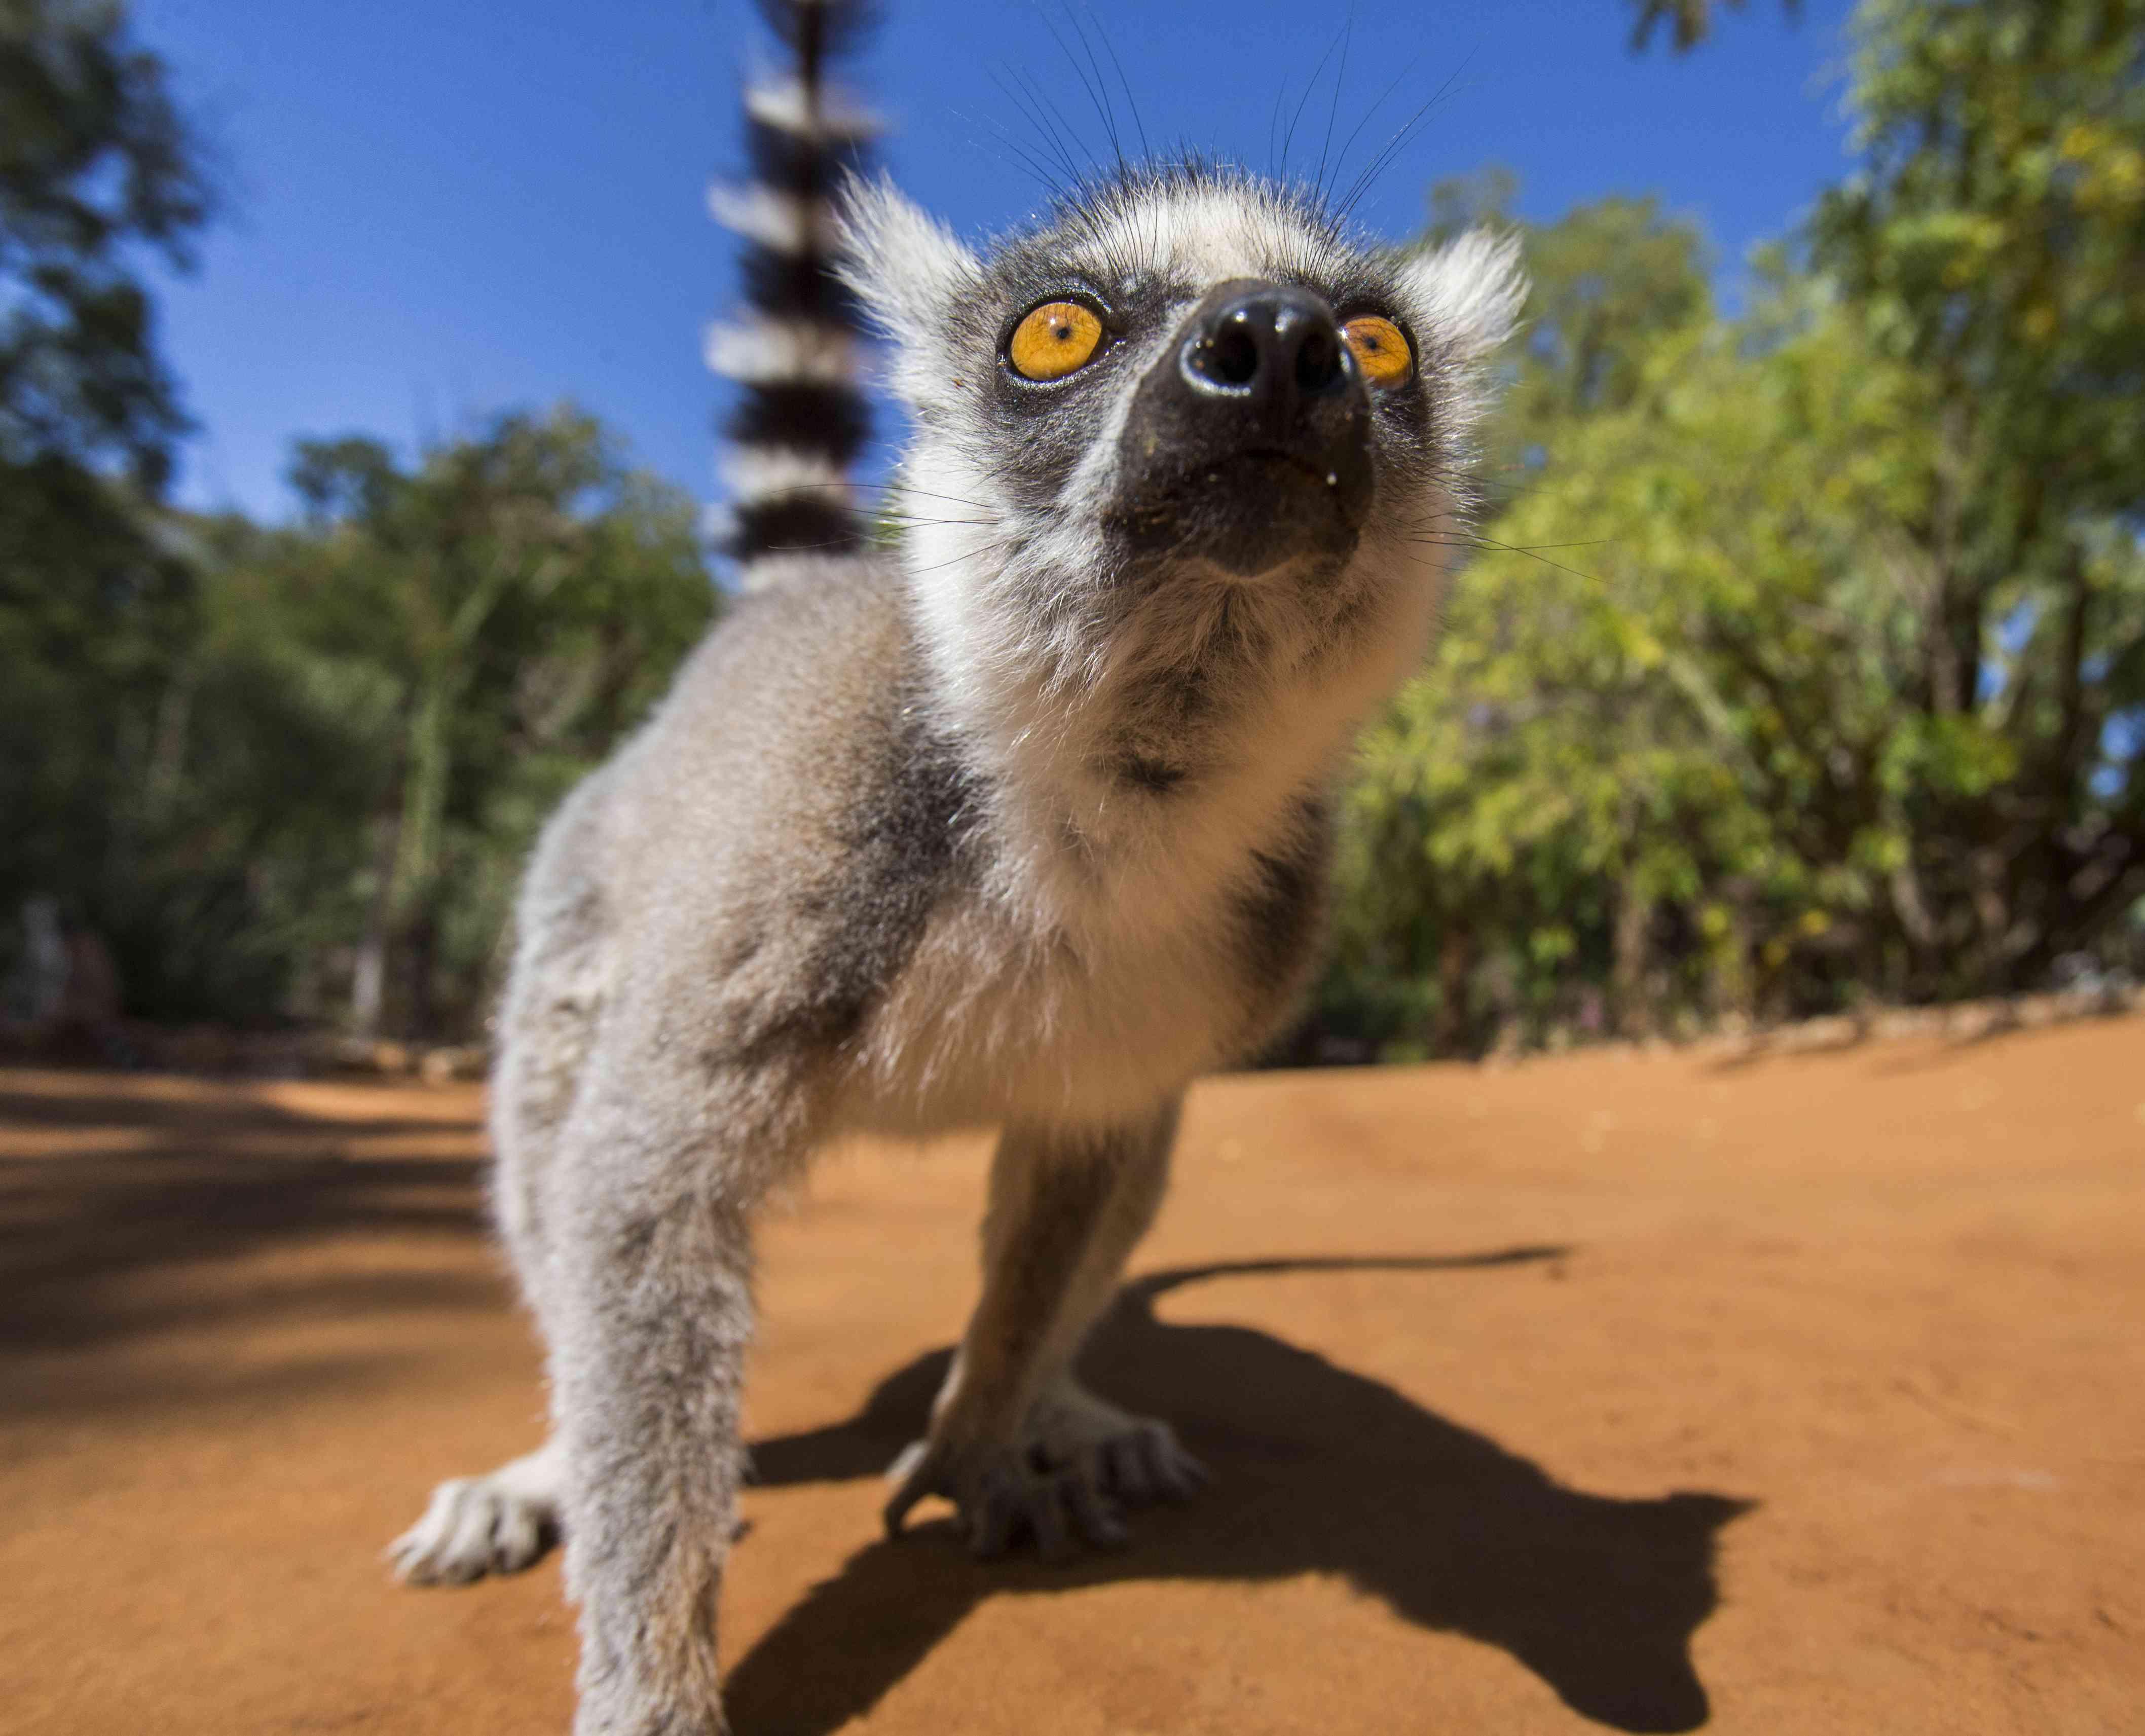 ring-tailed lemur close-up